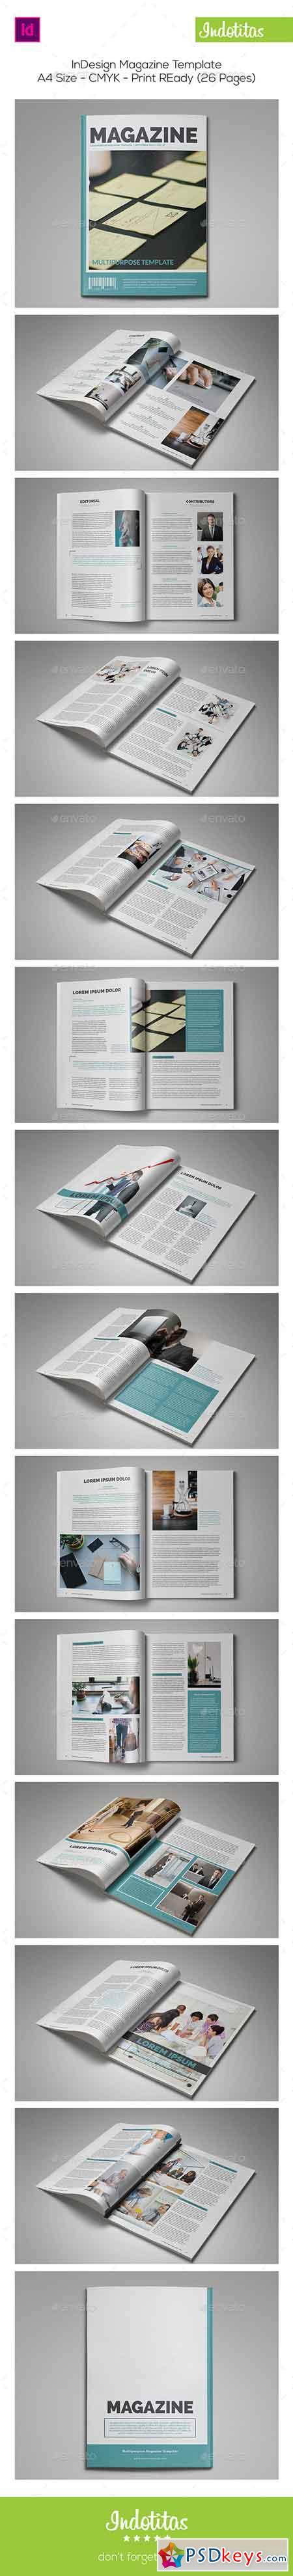 InDesign Magazine Template 8954436